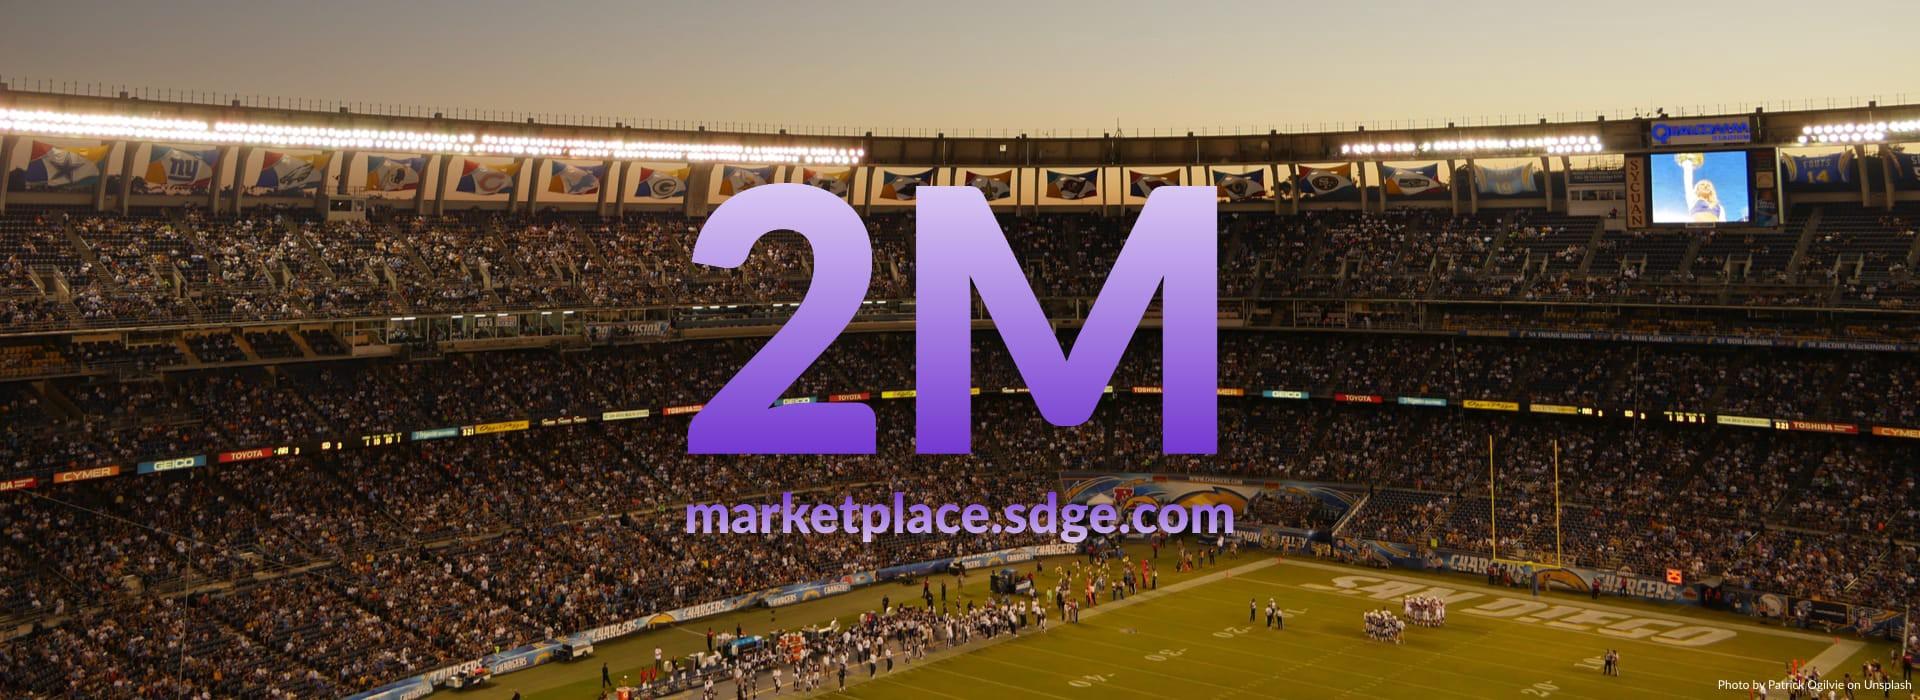 1.2 million customers, 2 million visits!